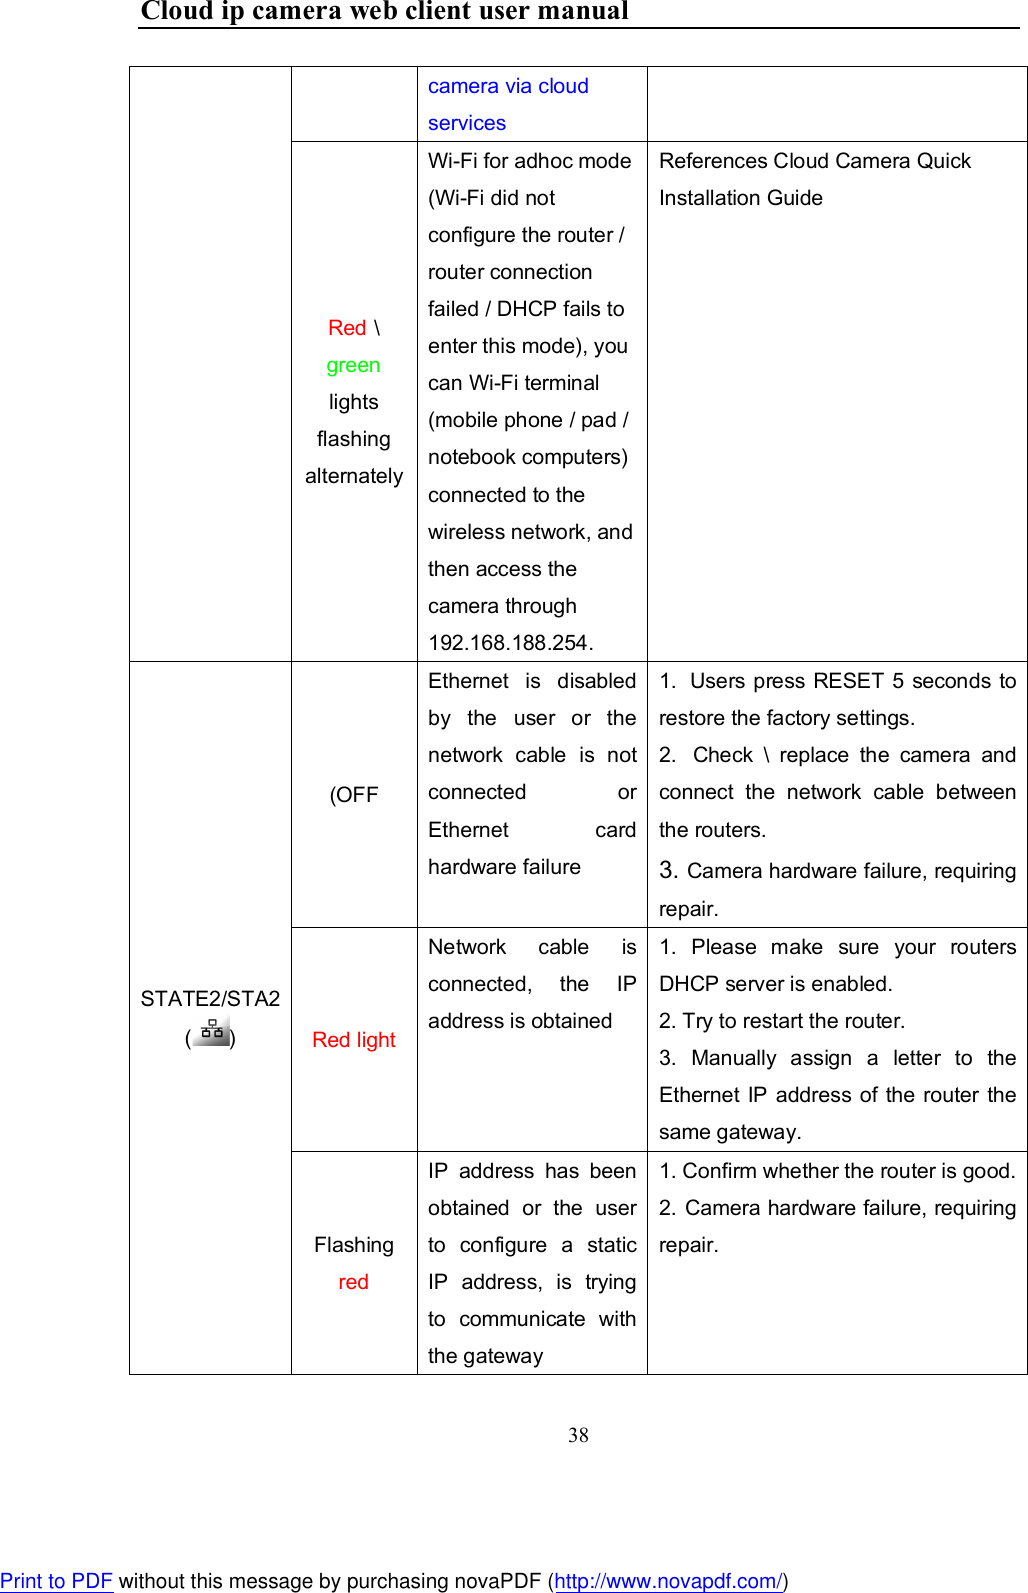 ShenZhen Fujikam Industry Development IPC02 Cloud Camera